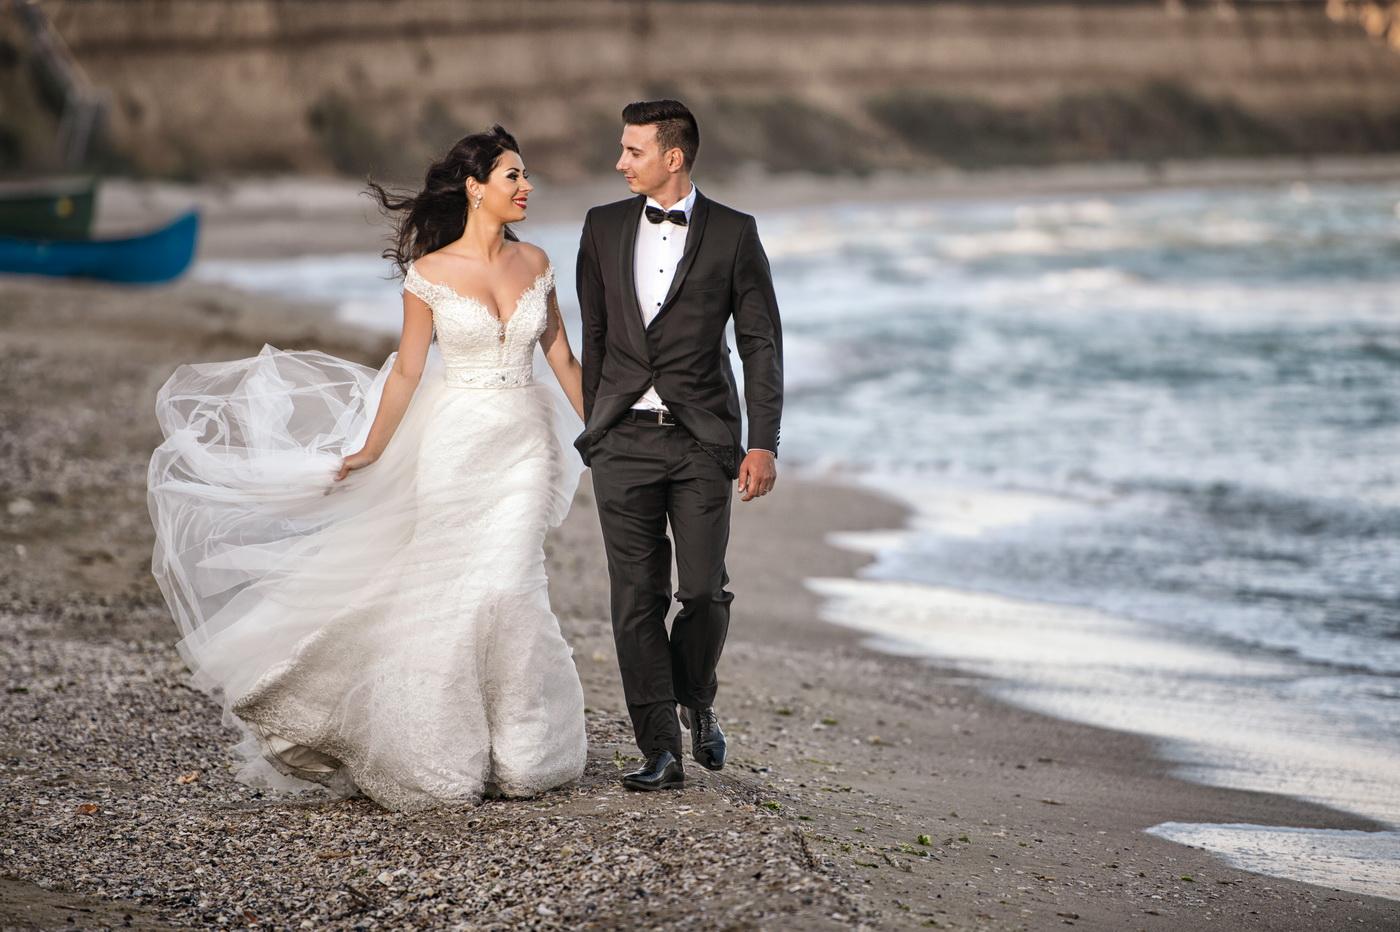 Destination Wedding Photographer_Marian Sterea_065.jpg